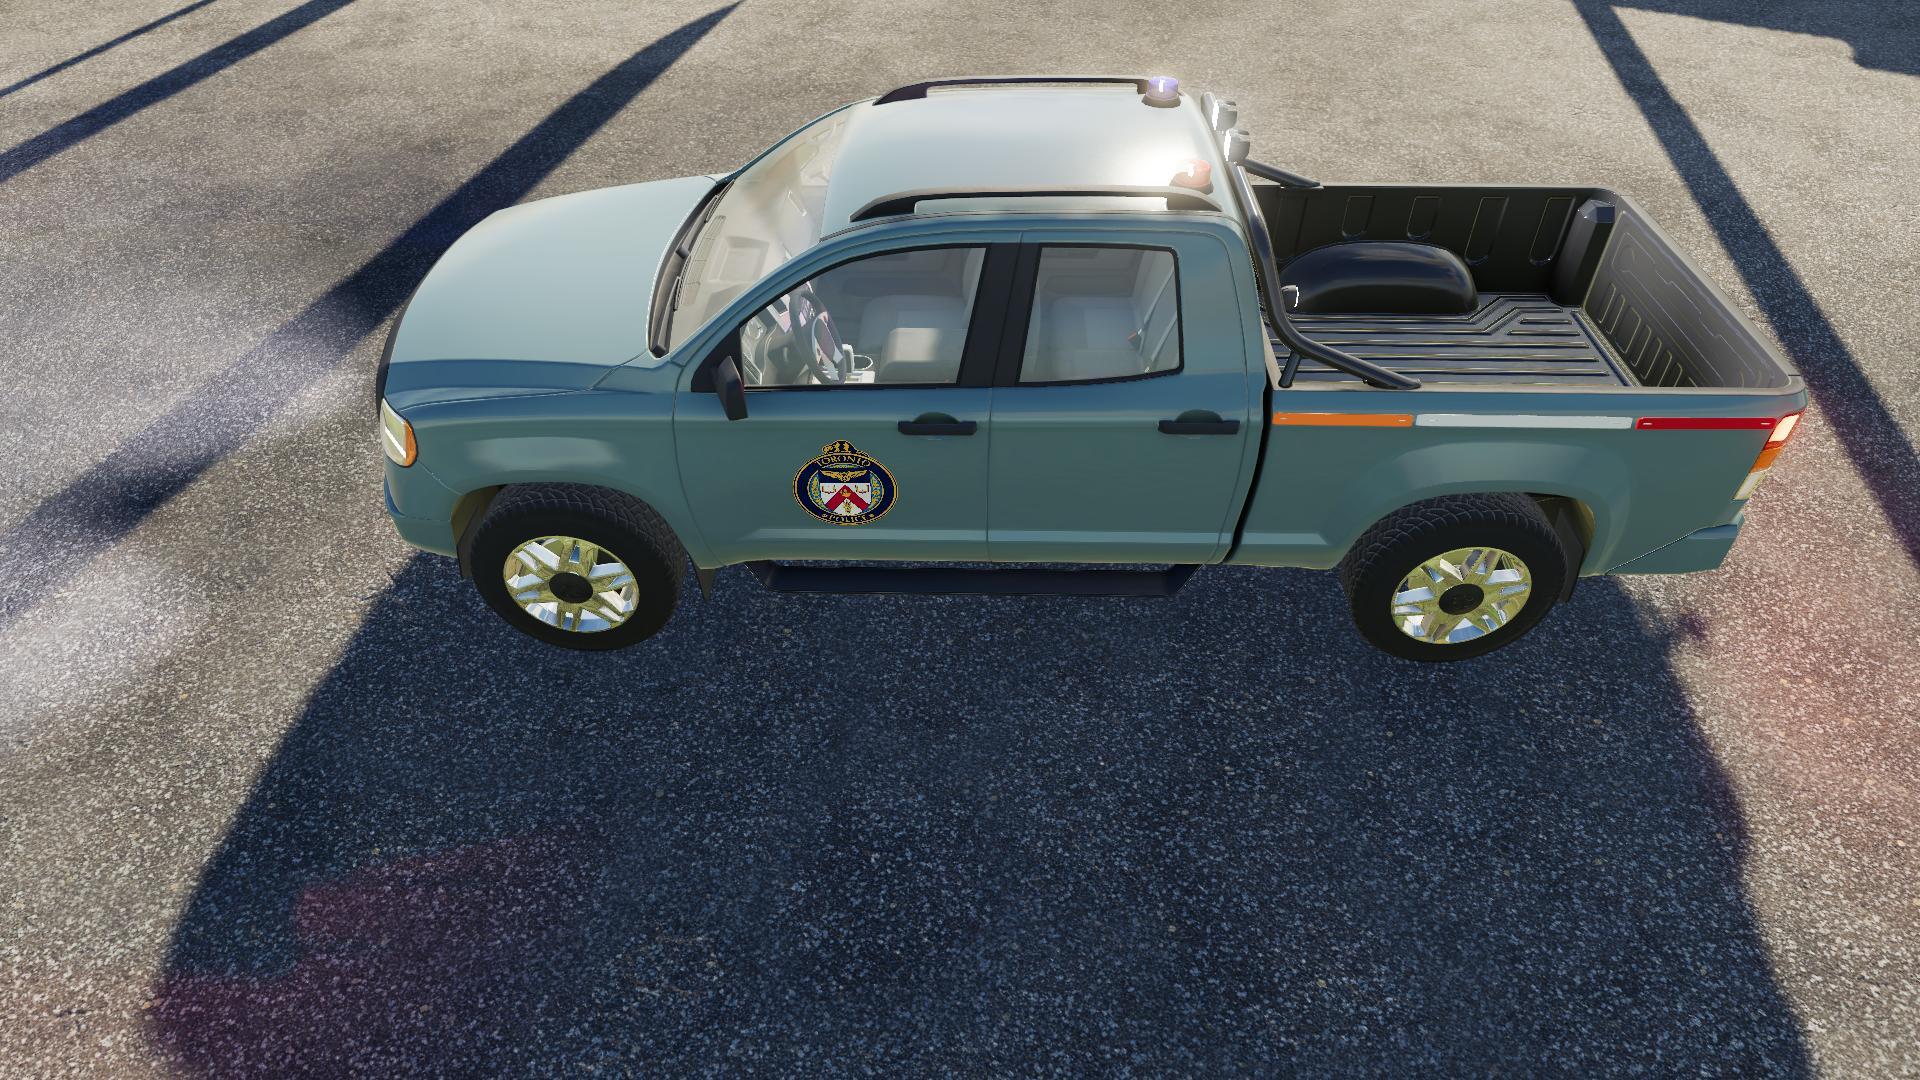 Pickup 2014 Police Edition V1 0 FS19 - Farming Simulator 19